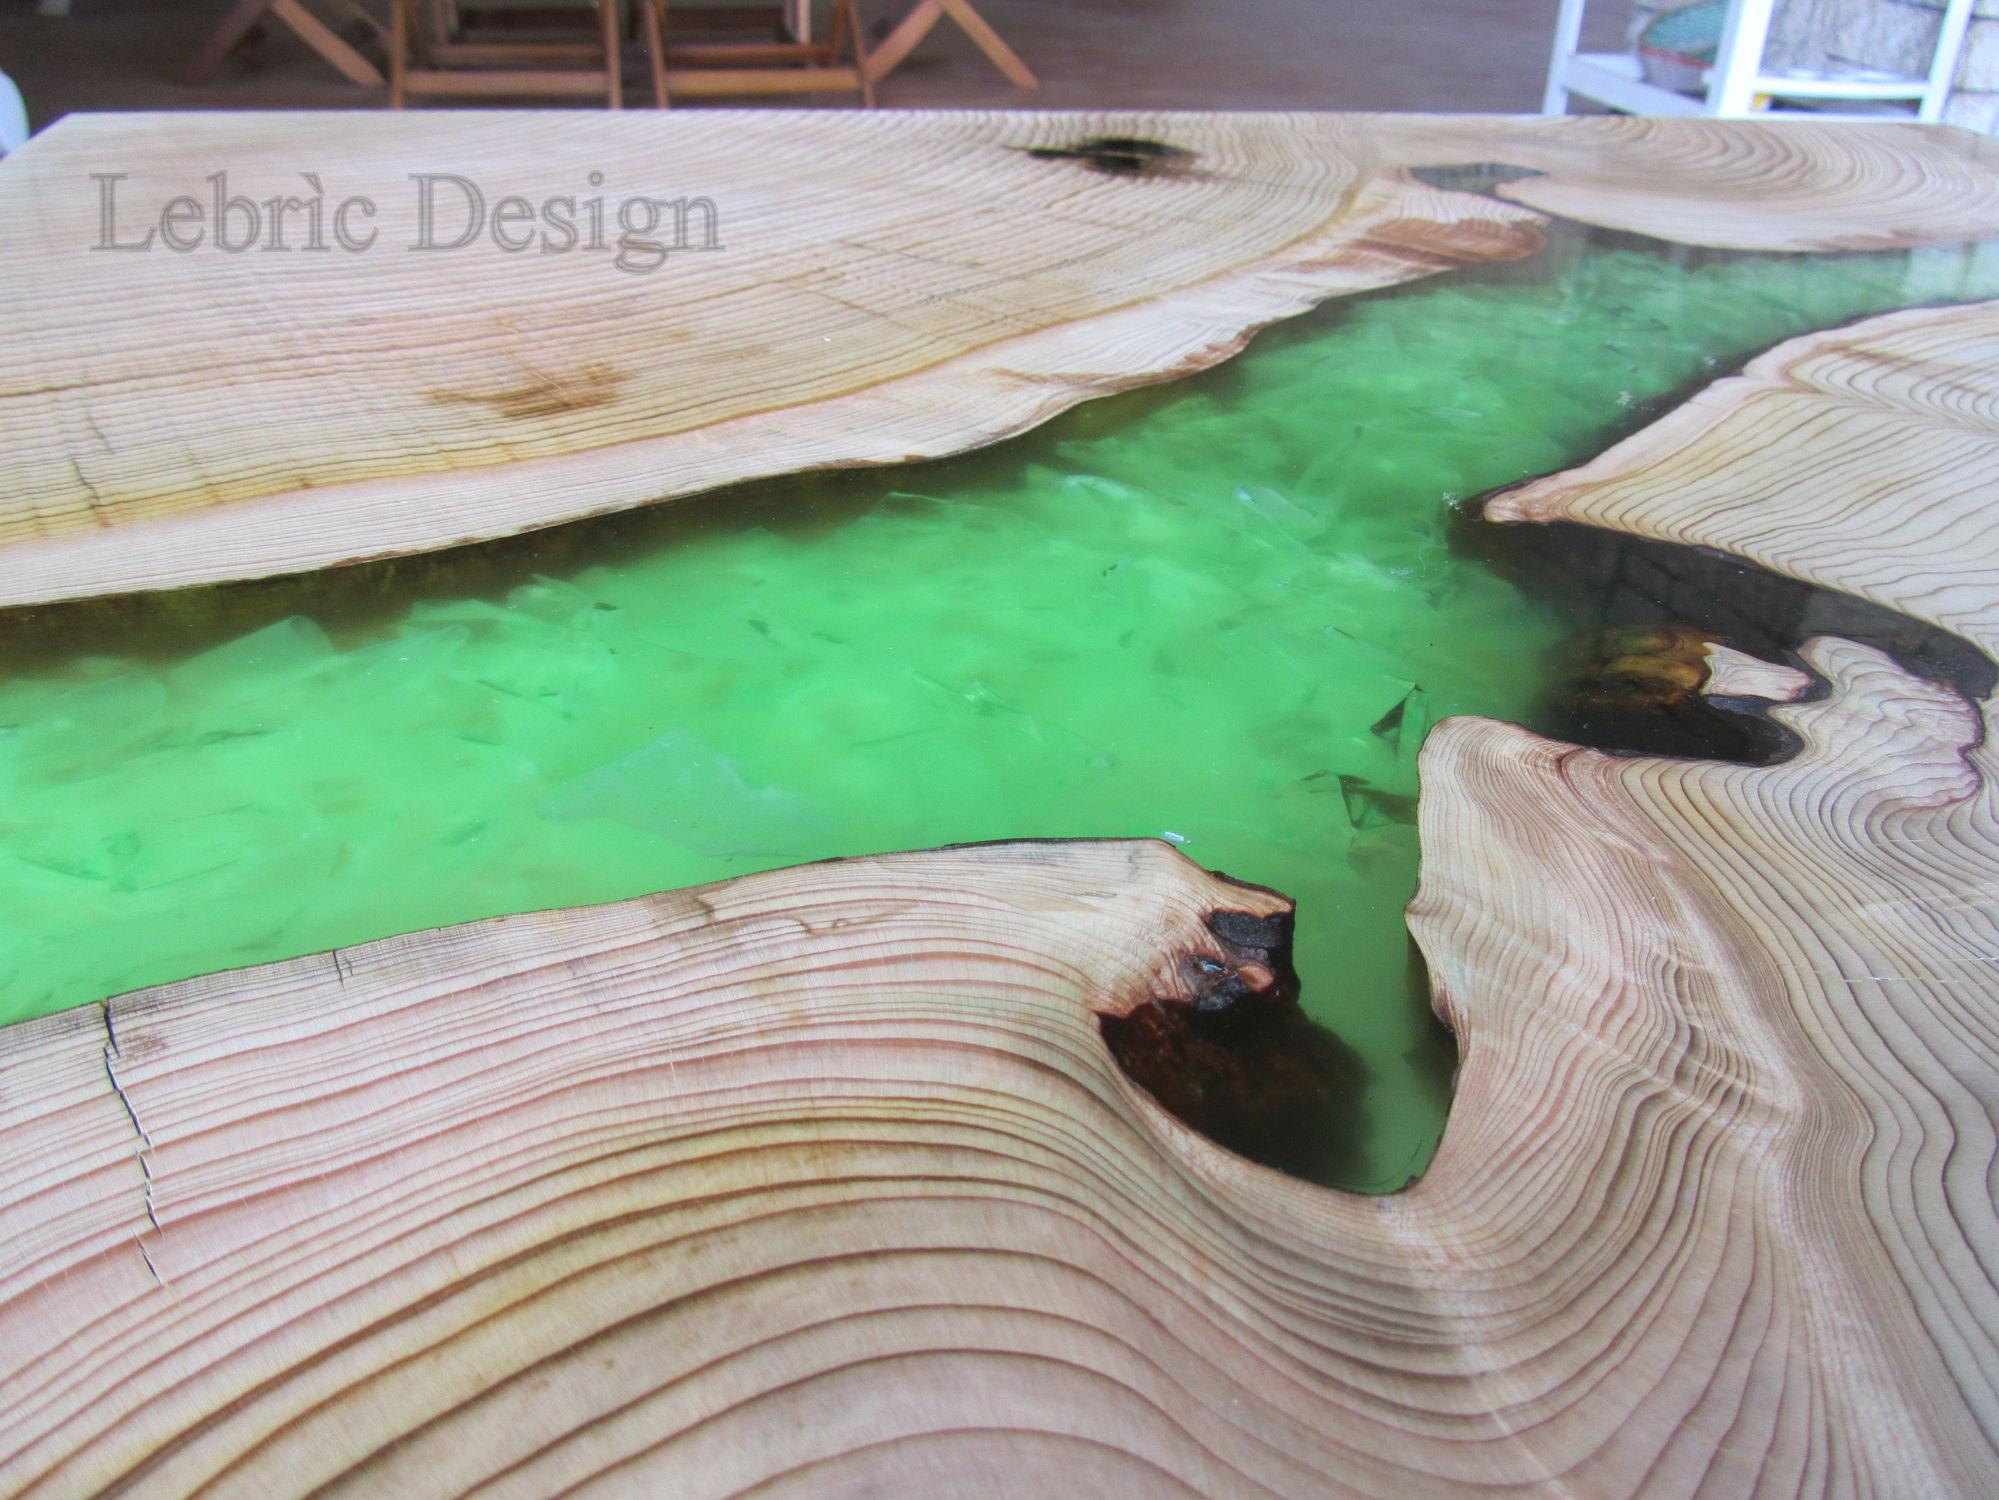 Wood table top designs - Wood Table Top Antico Trentino Di Lucio Srl